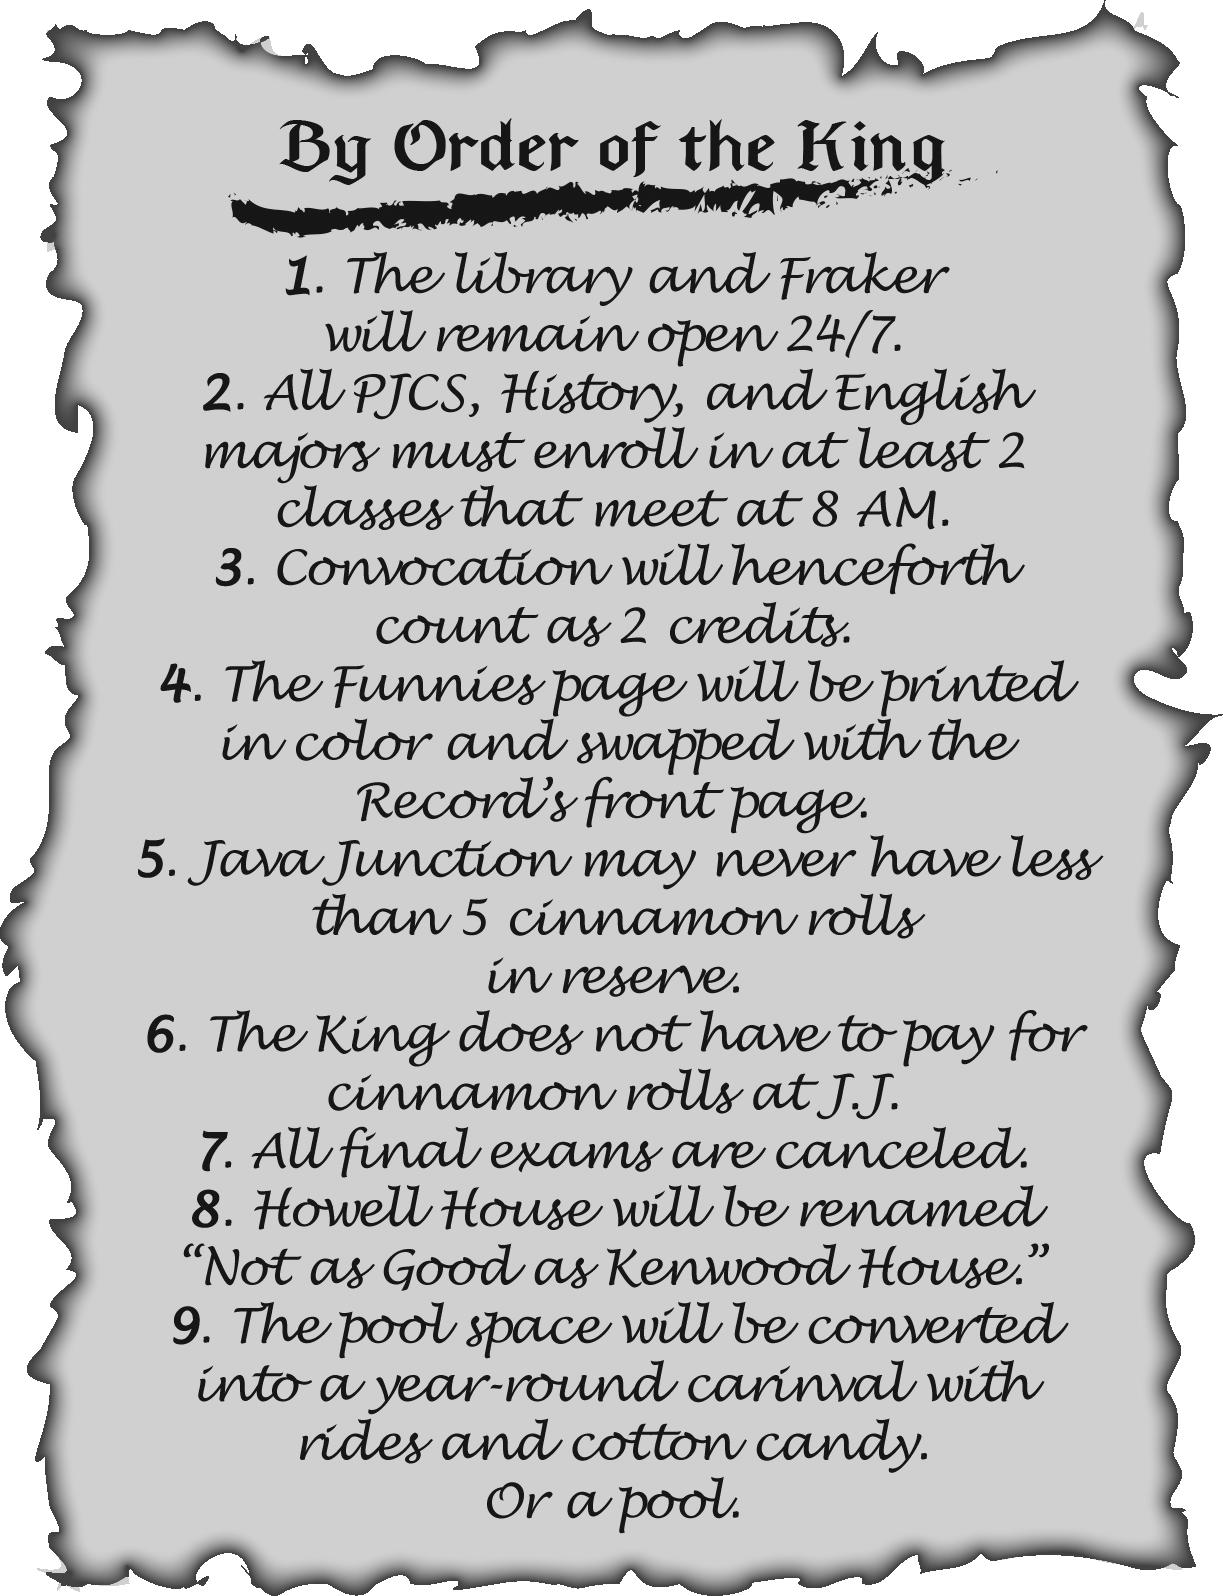 "List of orders in John Miller's ""By Order of the King"" decree"